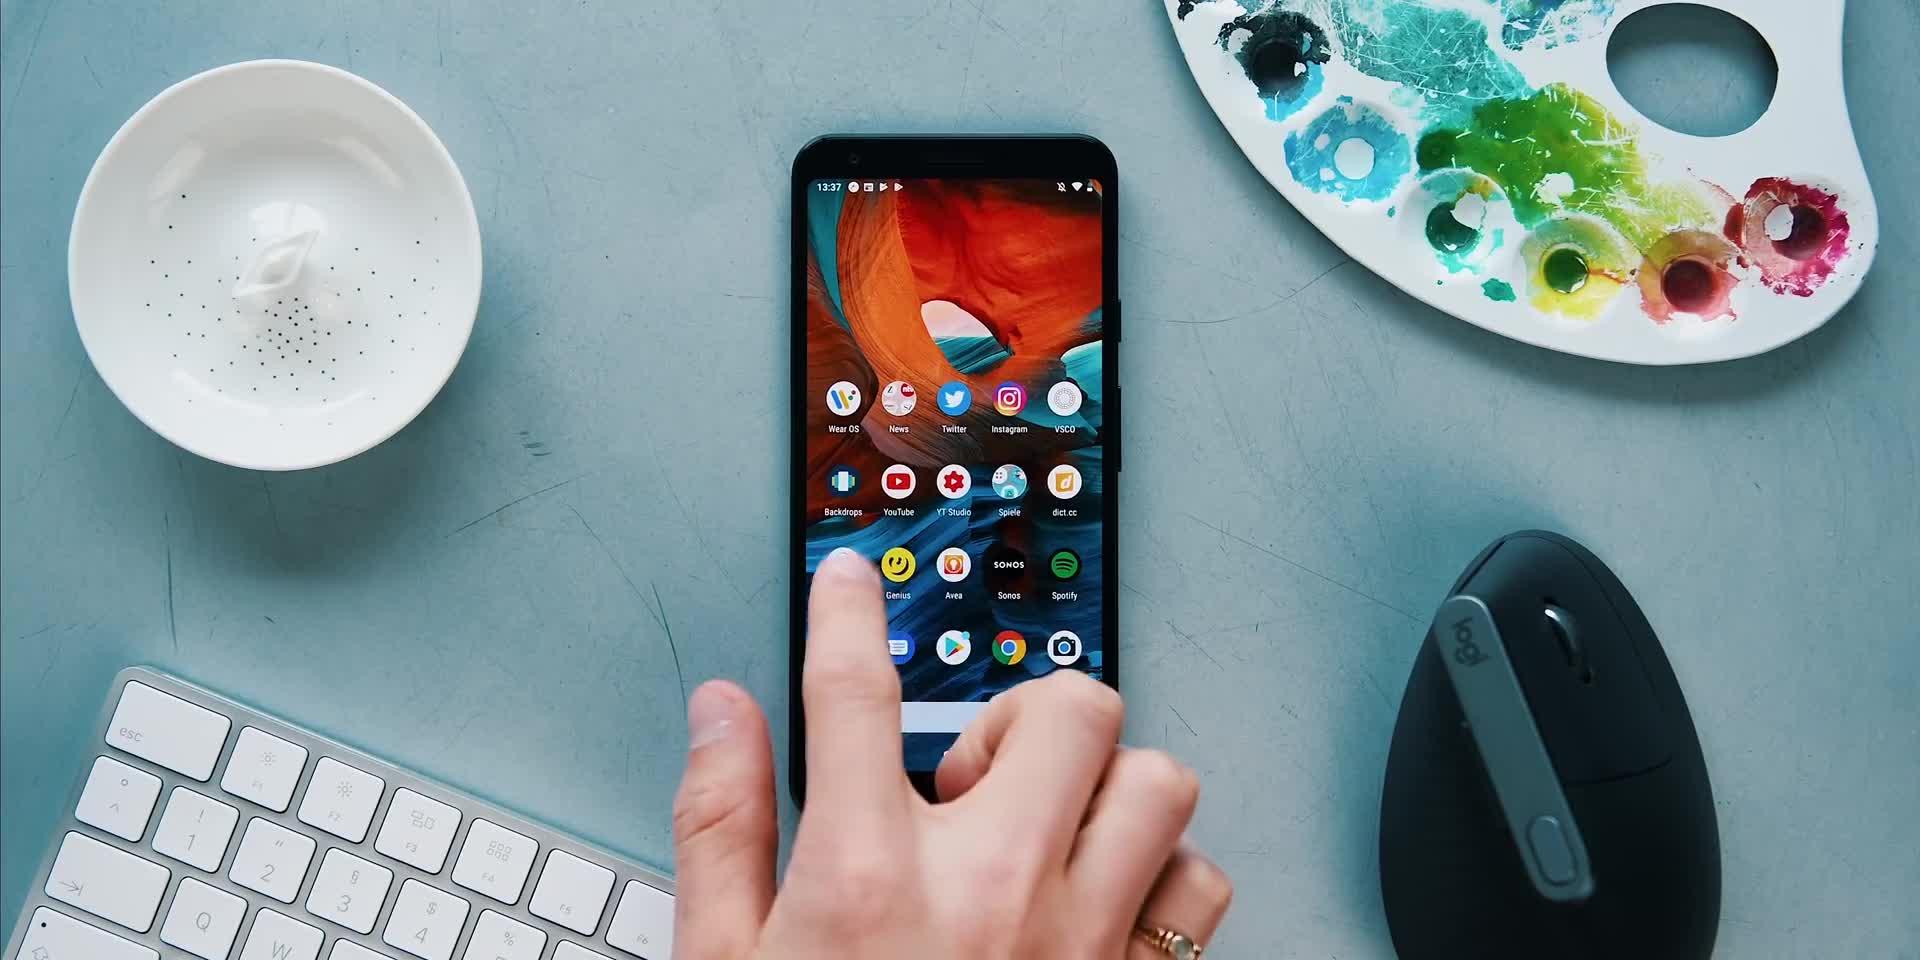 Smartphone, Google, Android, Test, Google Pixel, Google Pixel 3a XL, Jonas Kaniuth, TechnikFreundYT, Pixel 3a XL